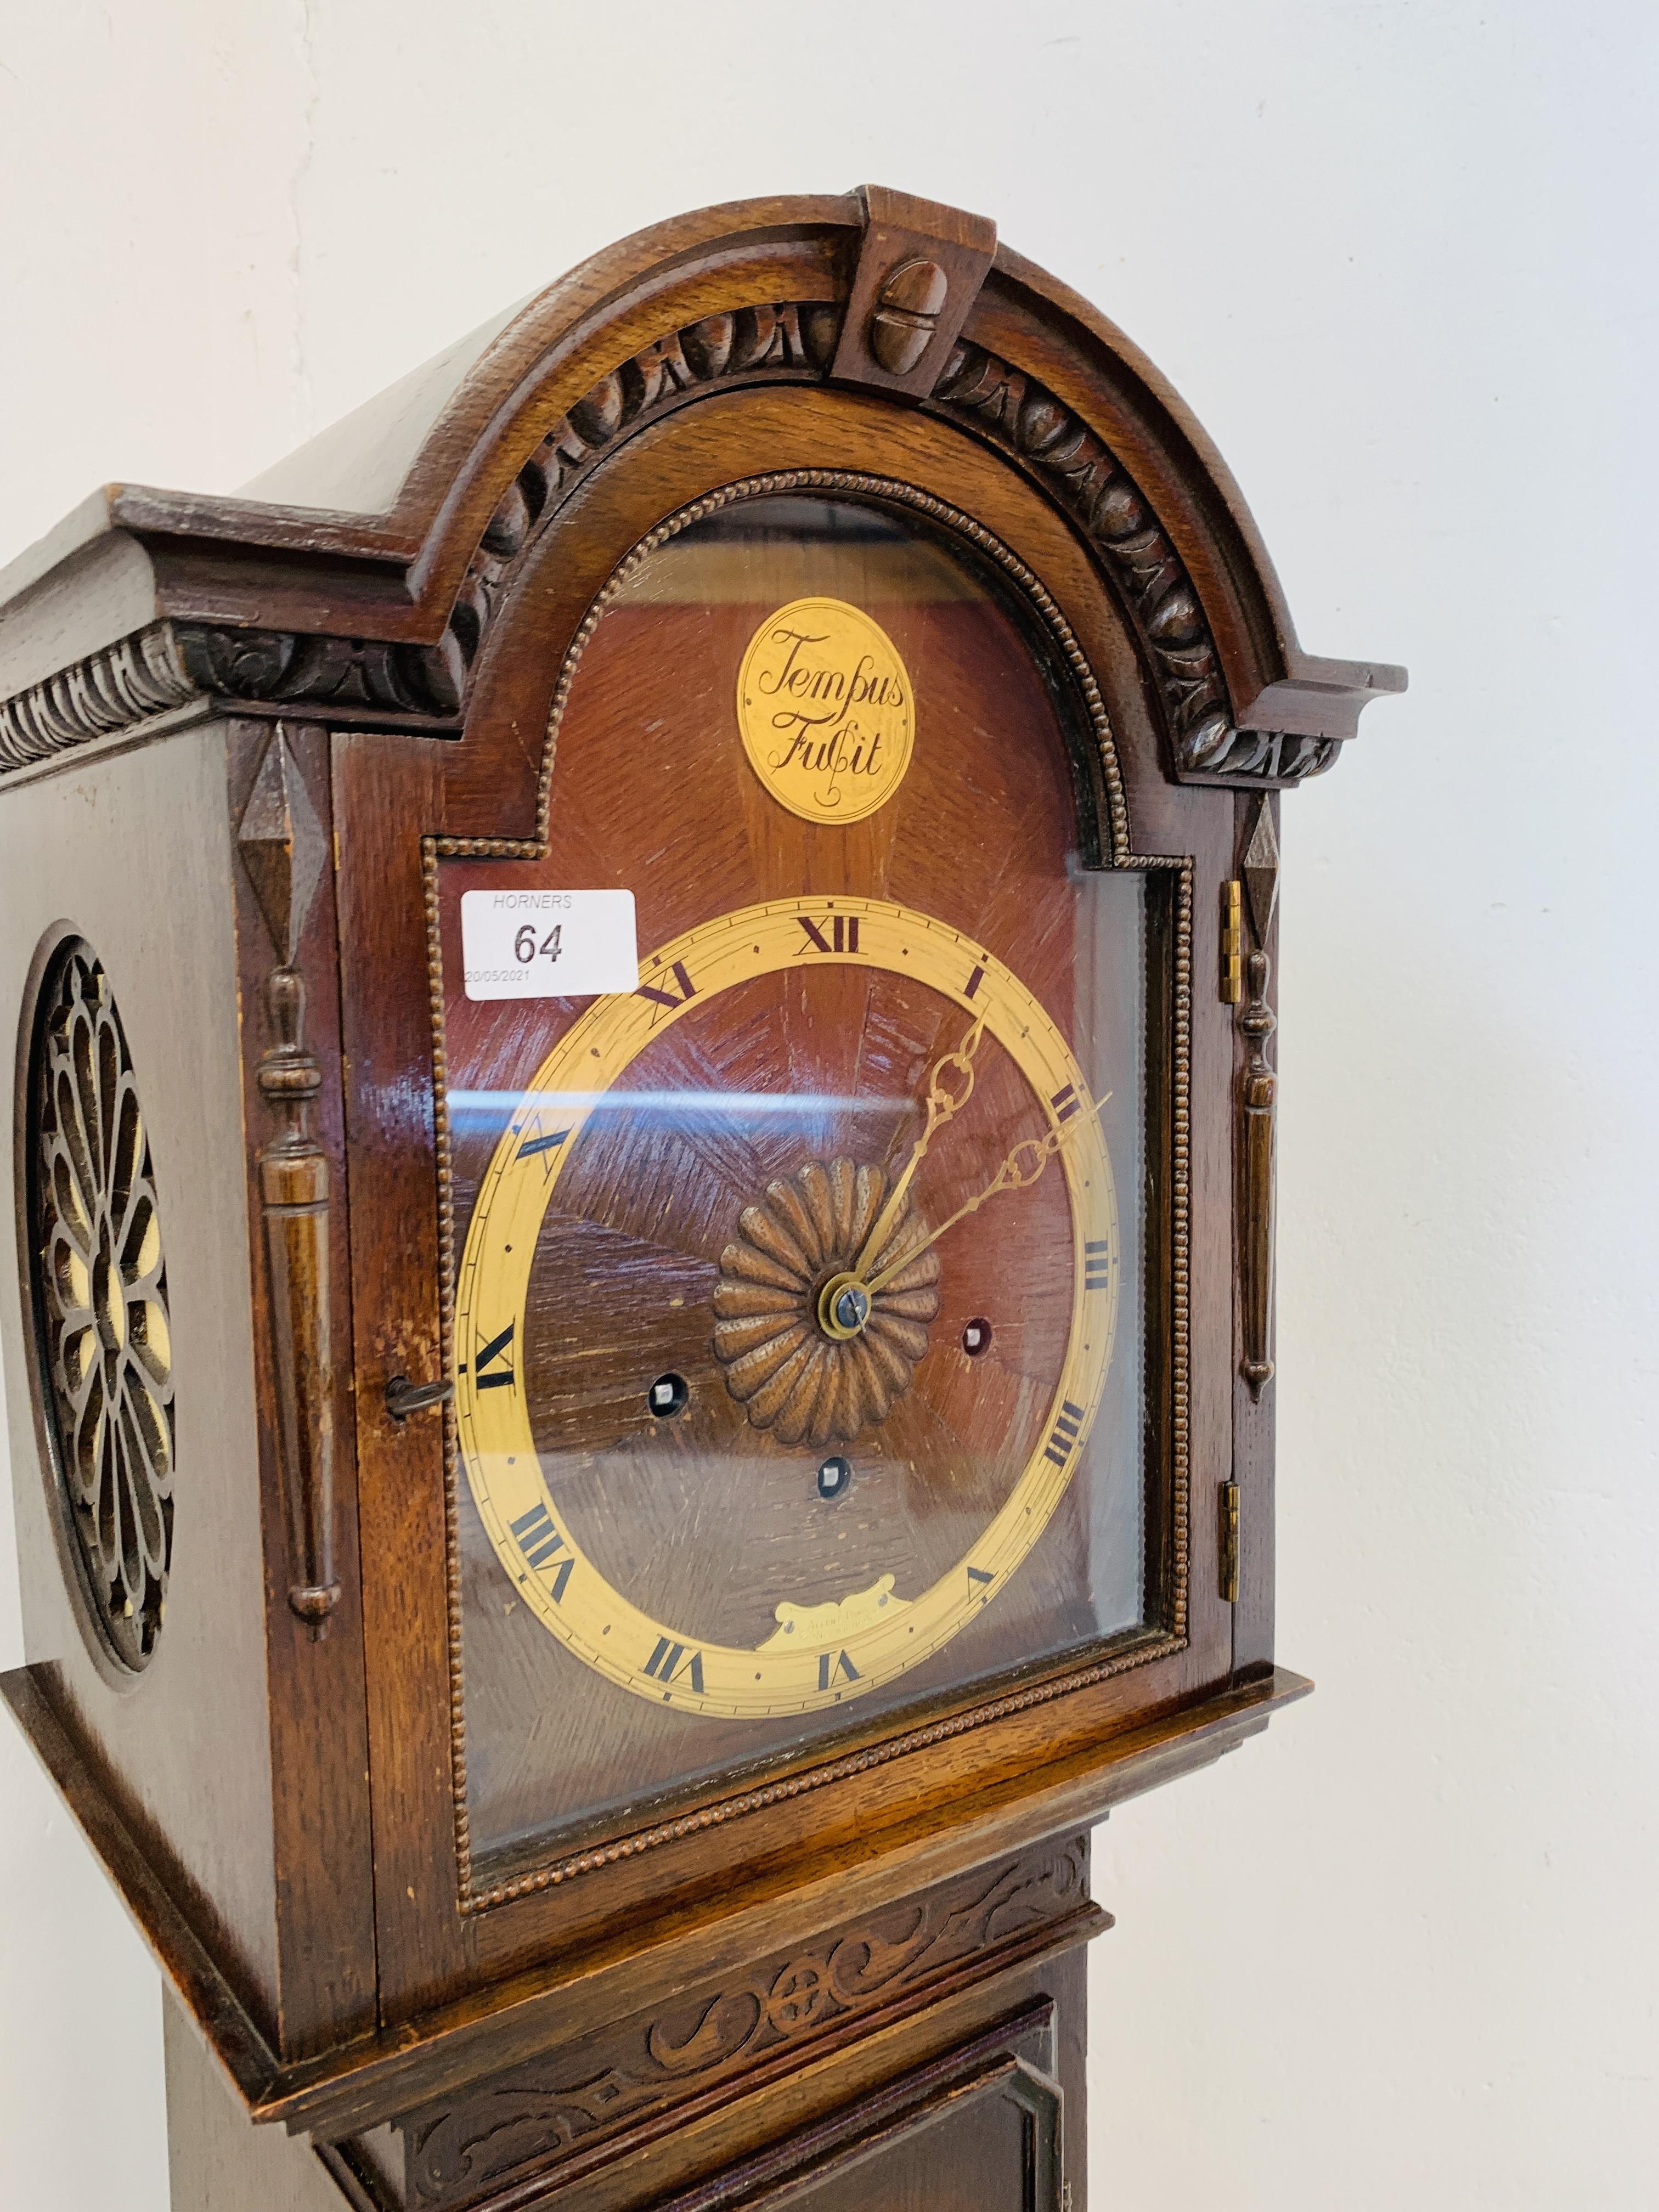 A 1940'S OAK CASED GRANDMOTHER CLOCK, - Image 7 of 12